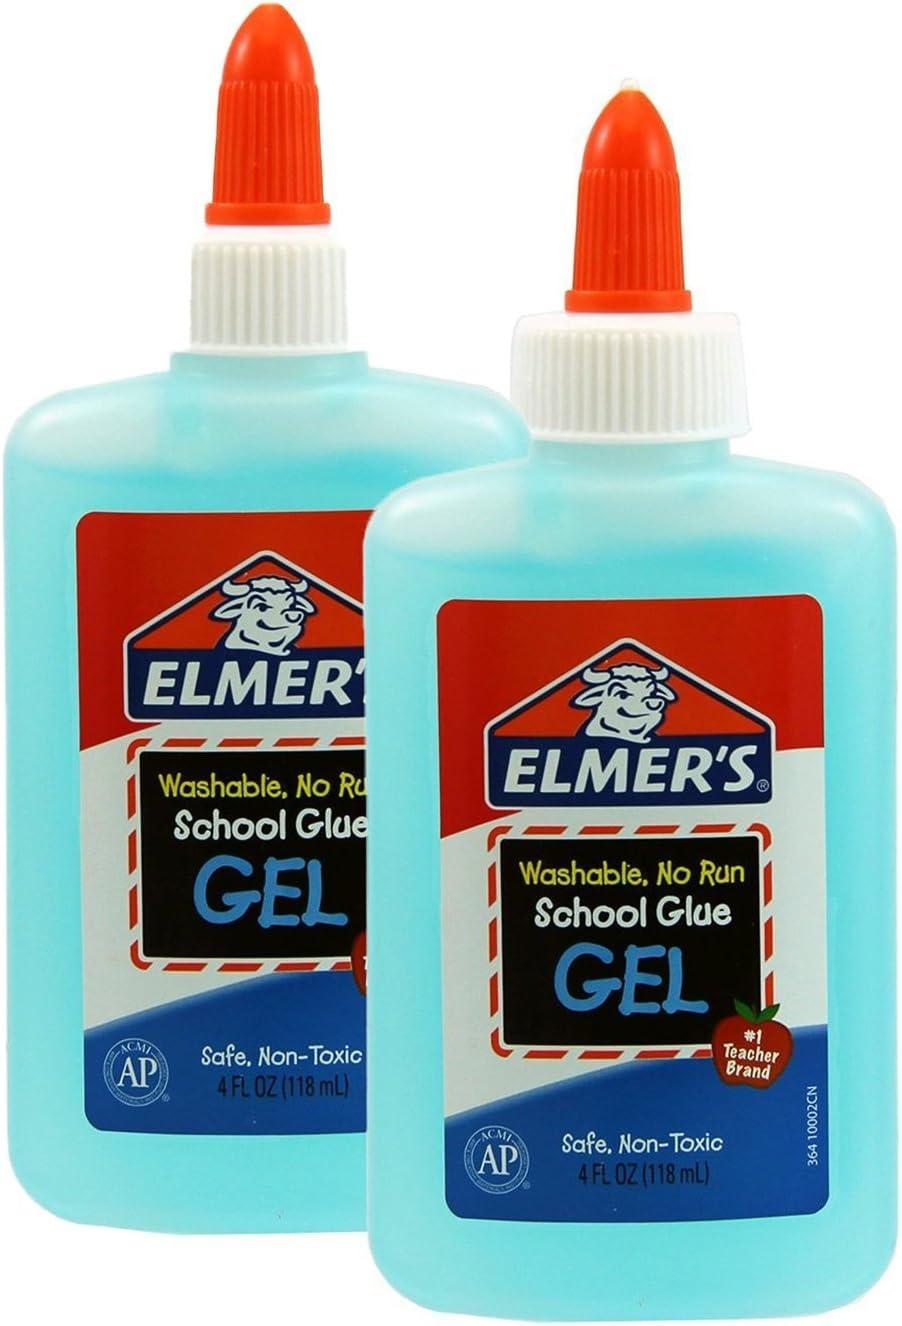 Elmers Washable No Run Gel School Glue (Pack of 2)